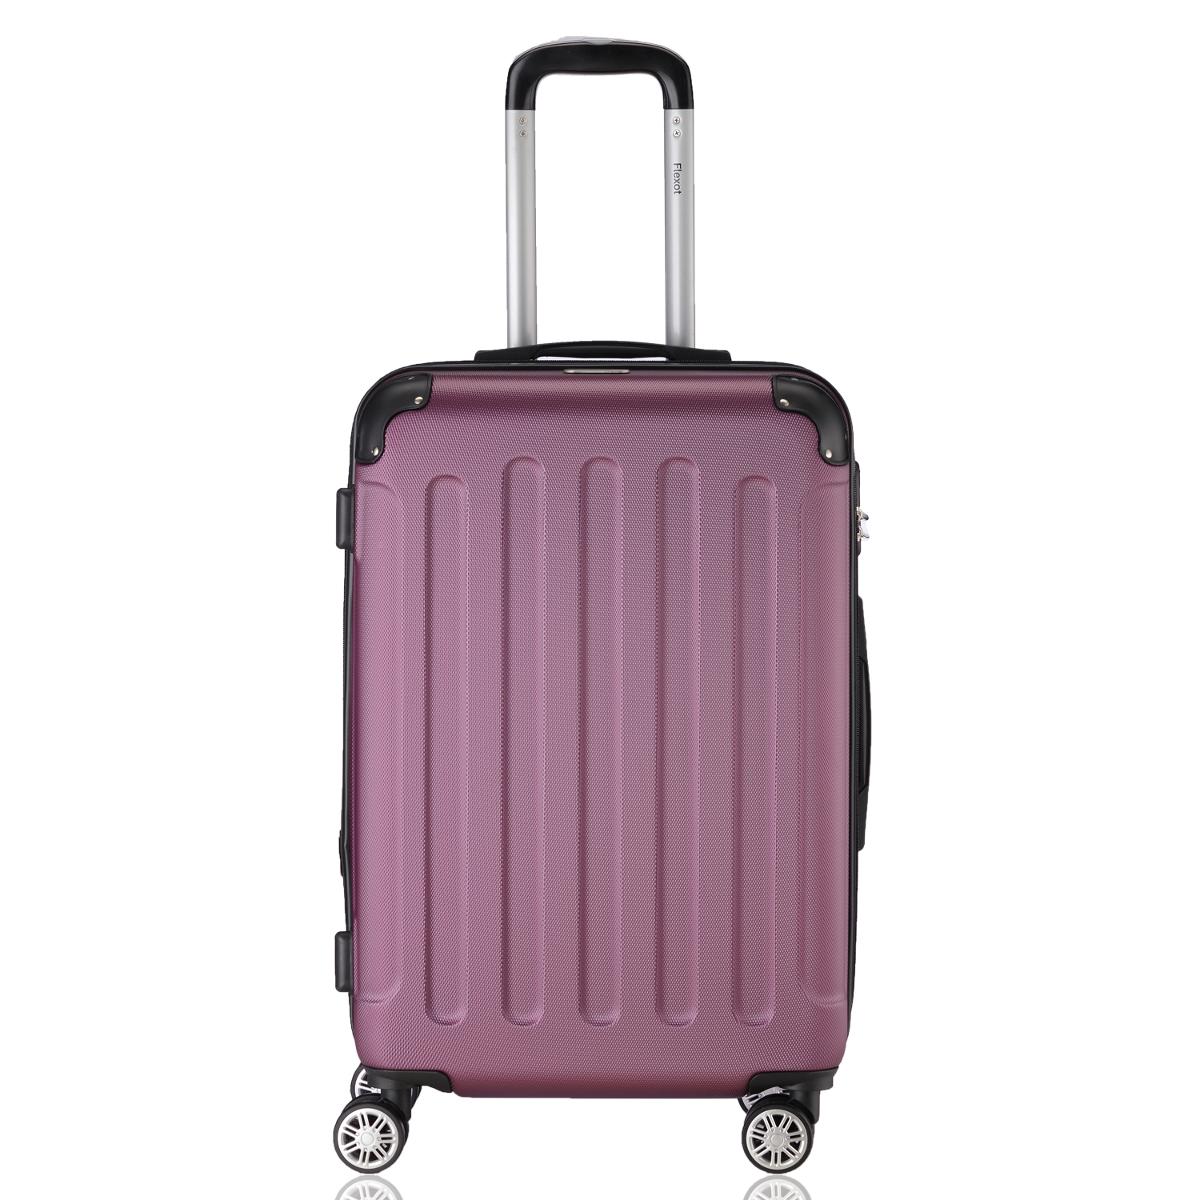 Koffer-Flexot-2045-Hartschalenkoffer-Trolley-Kofferset-Reisekoffer-M-L-XL-Set Indexbild 82